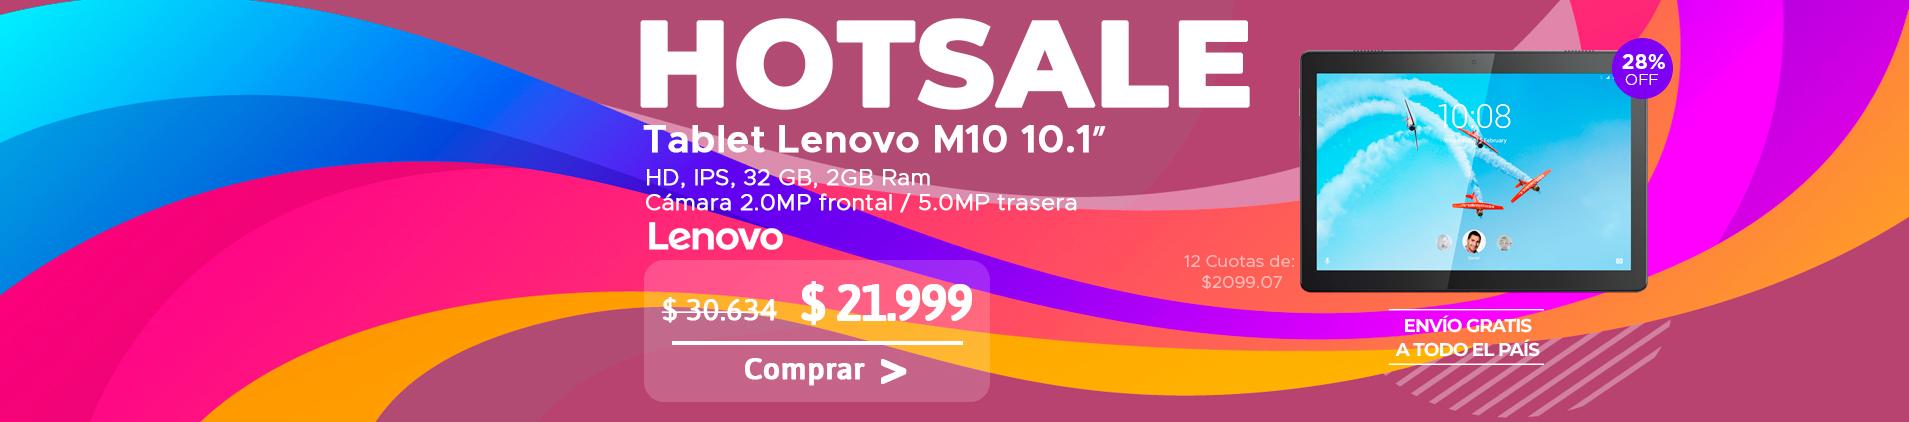 Tablet Lenovo M10